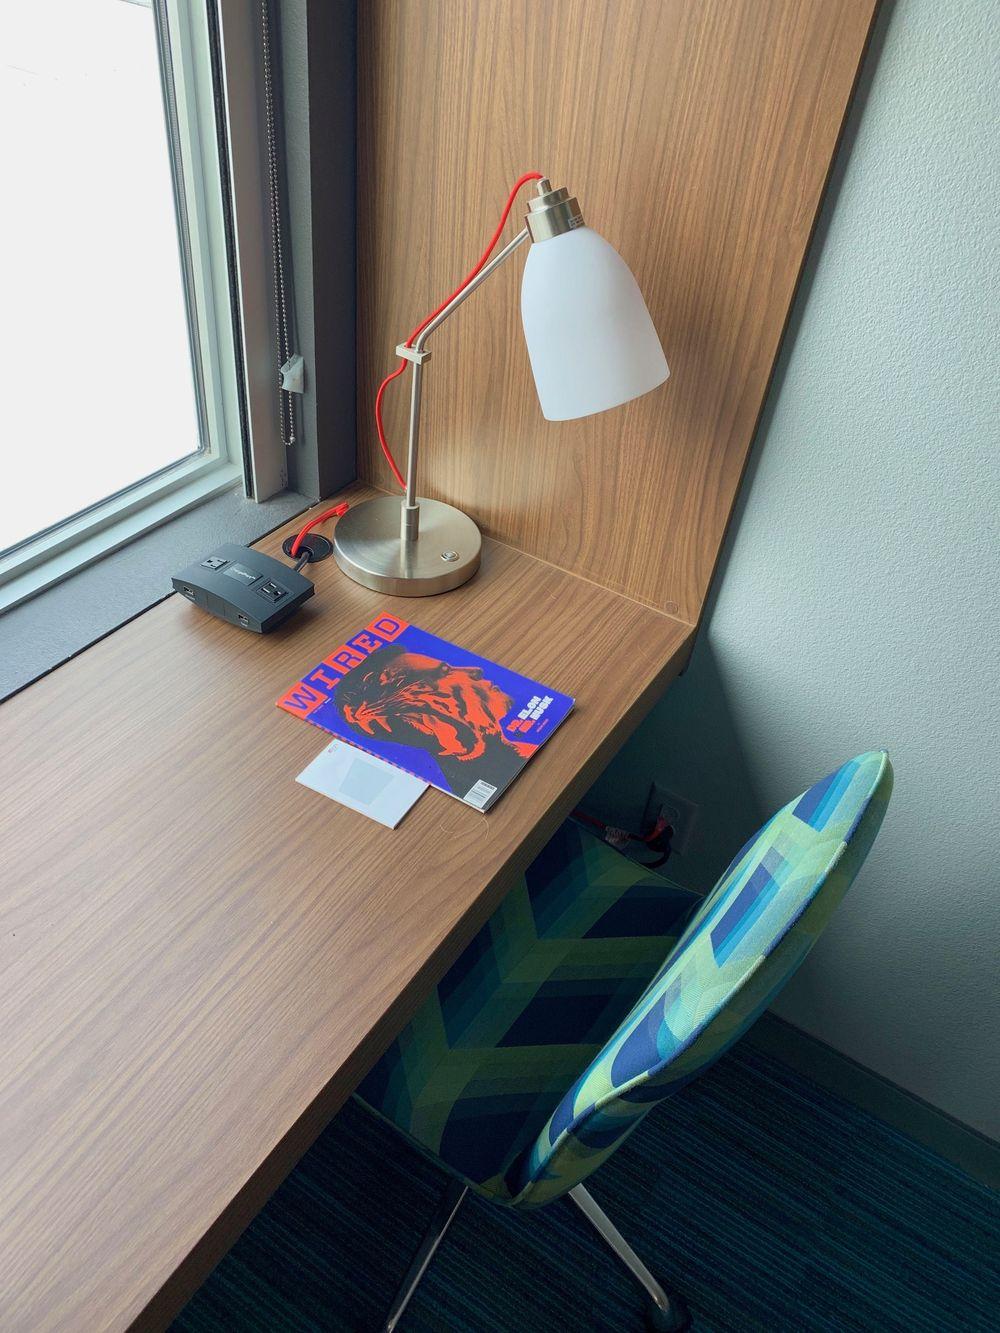 Working desk at the Corpus Christi Aloft Hotel